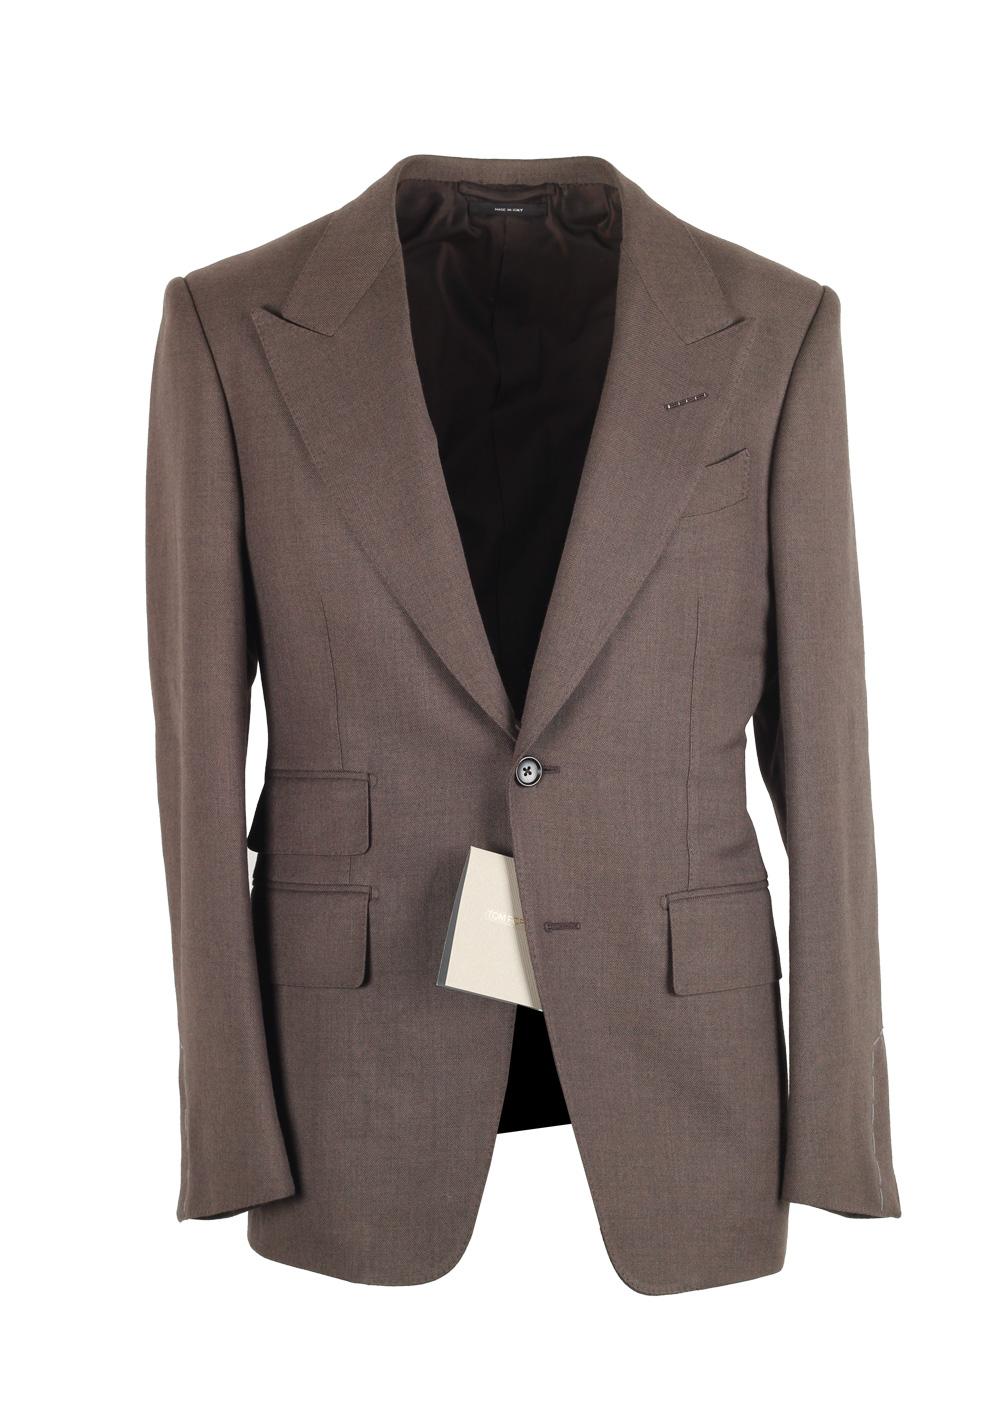 TOM FORD Shelton Solid Brown Suit Size 44C / 34S U.S.   Costume Limité